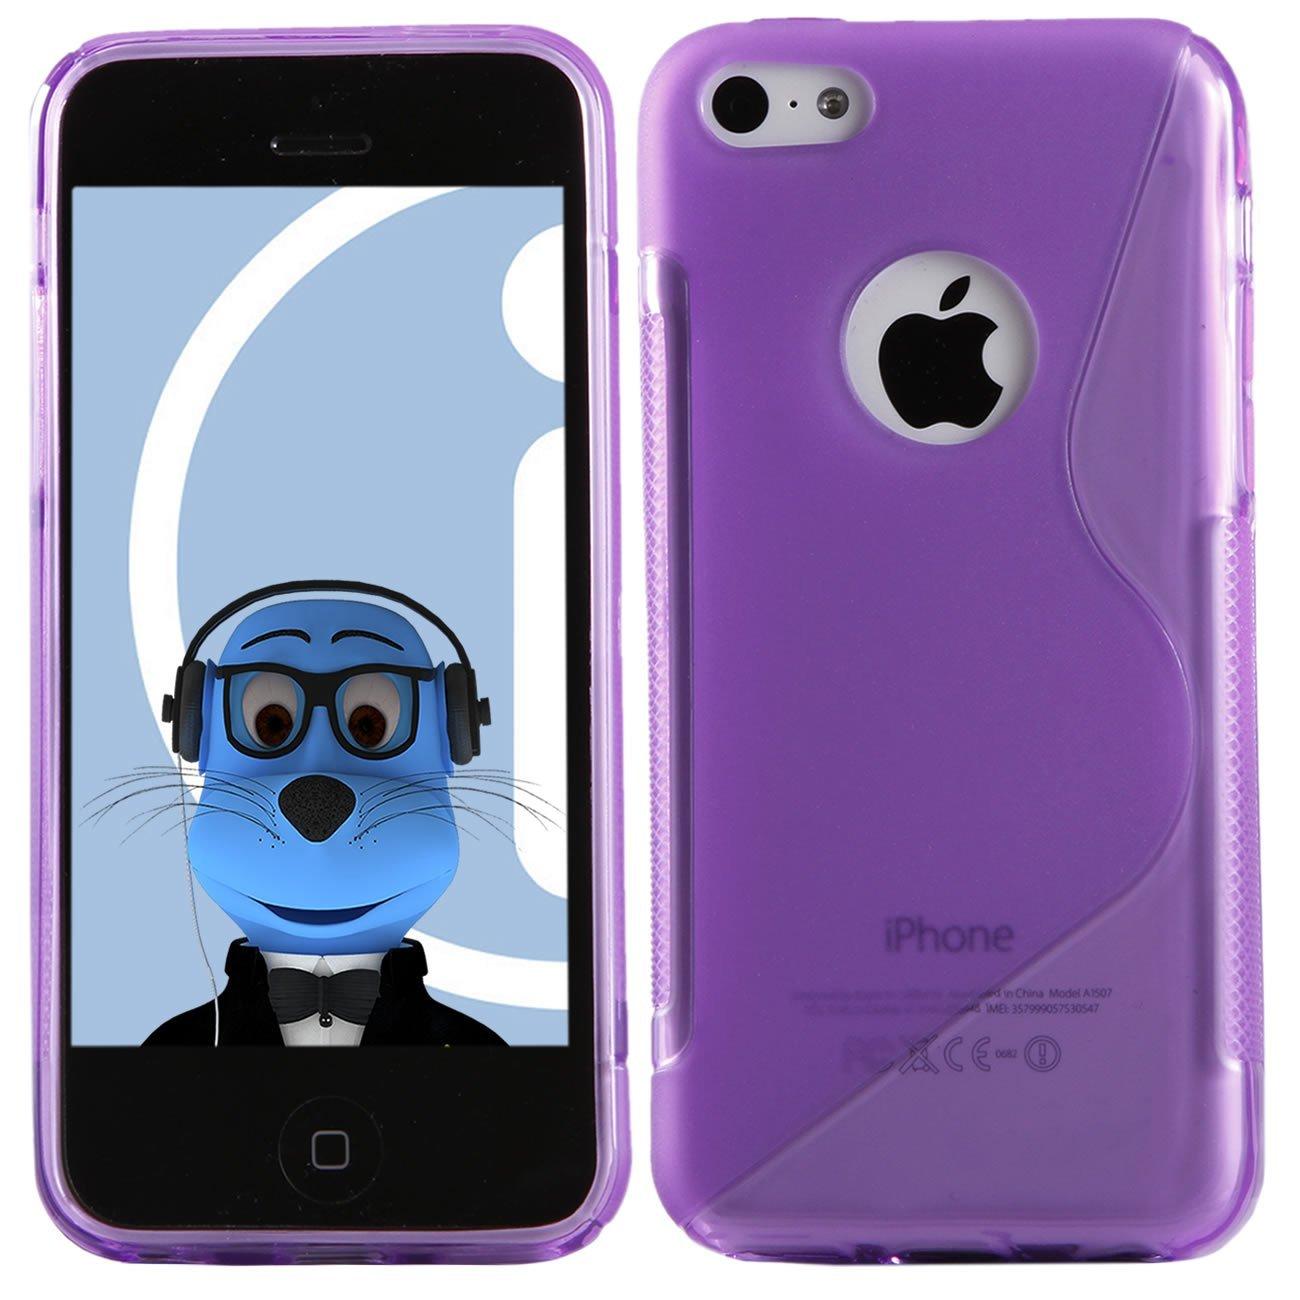 silicone iphone 5c violet pour iphone 5. Black Bedroom Furniture Sets. Home Design Ideas